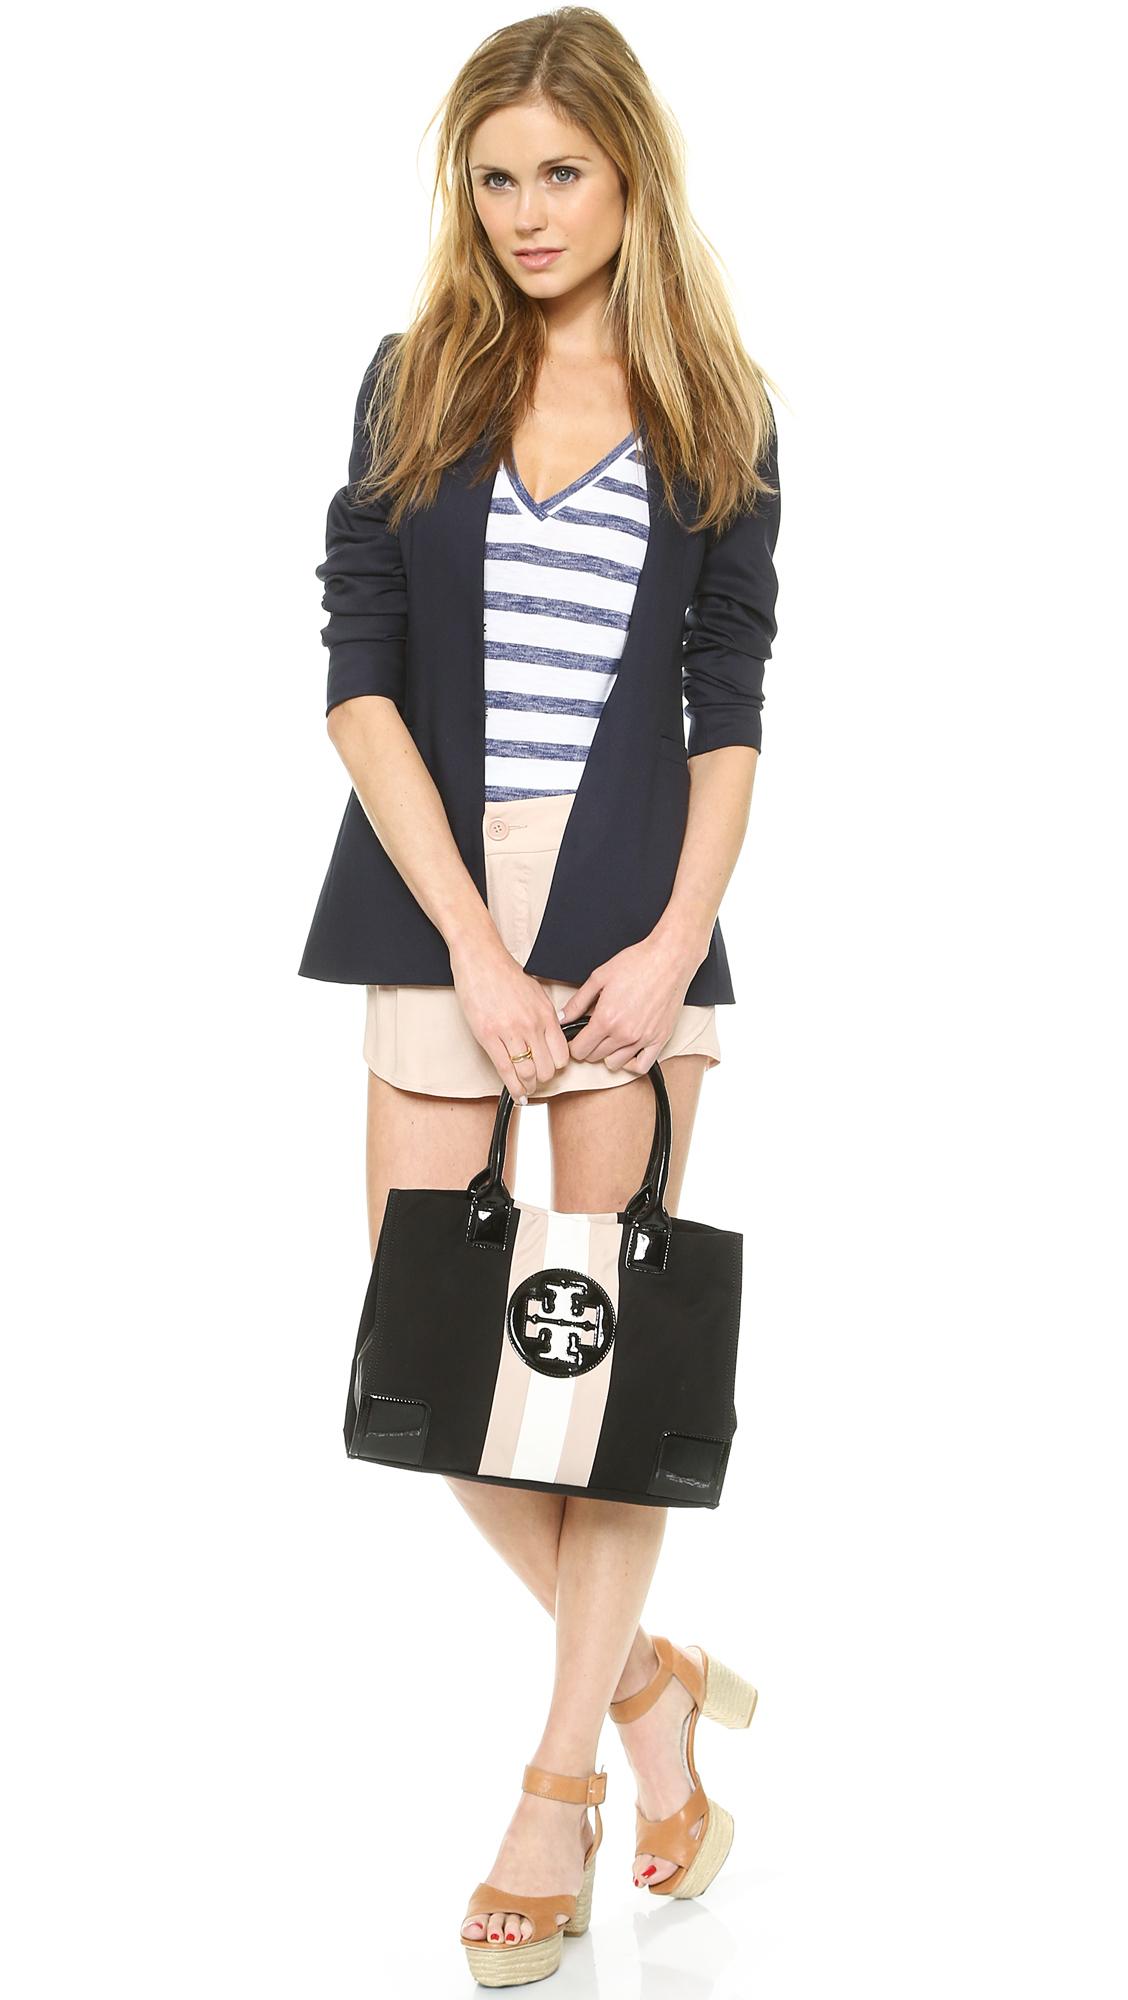 Tory Burch Ella Mini Striped Tote Blackblushivory In Black